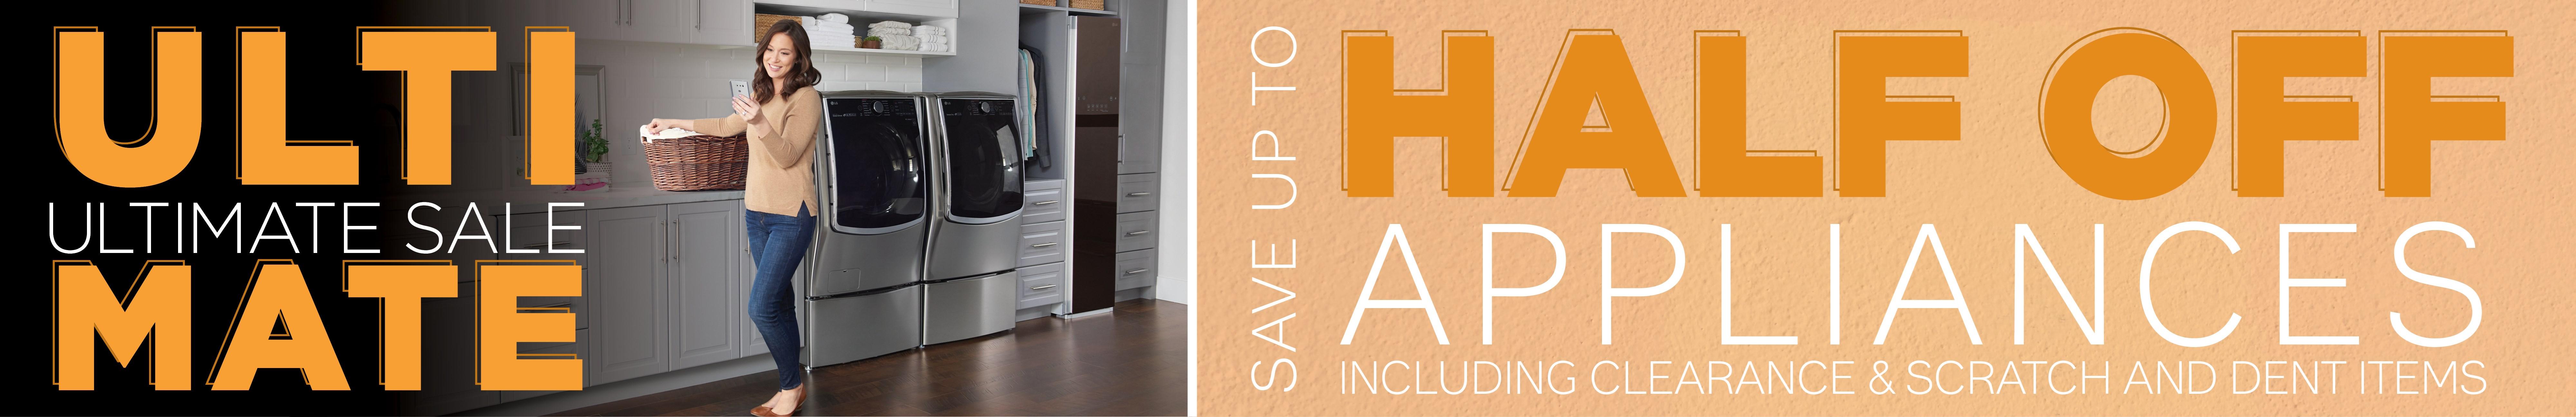 Furnture & ApplianceMart Ultimate Sale